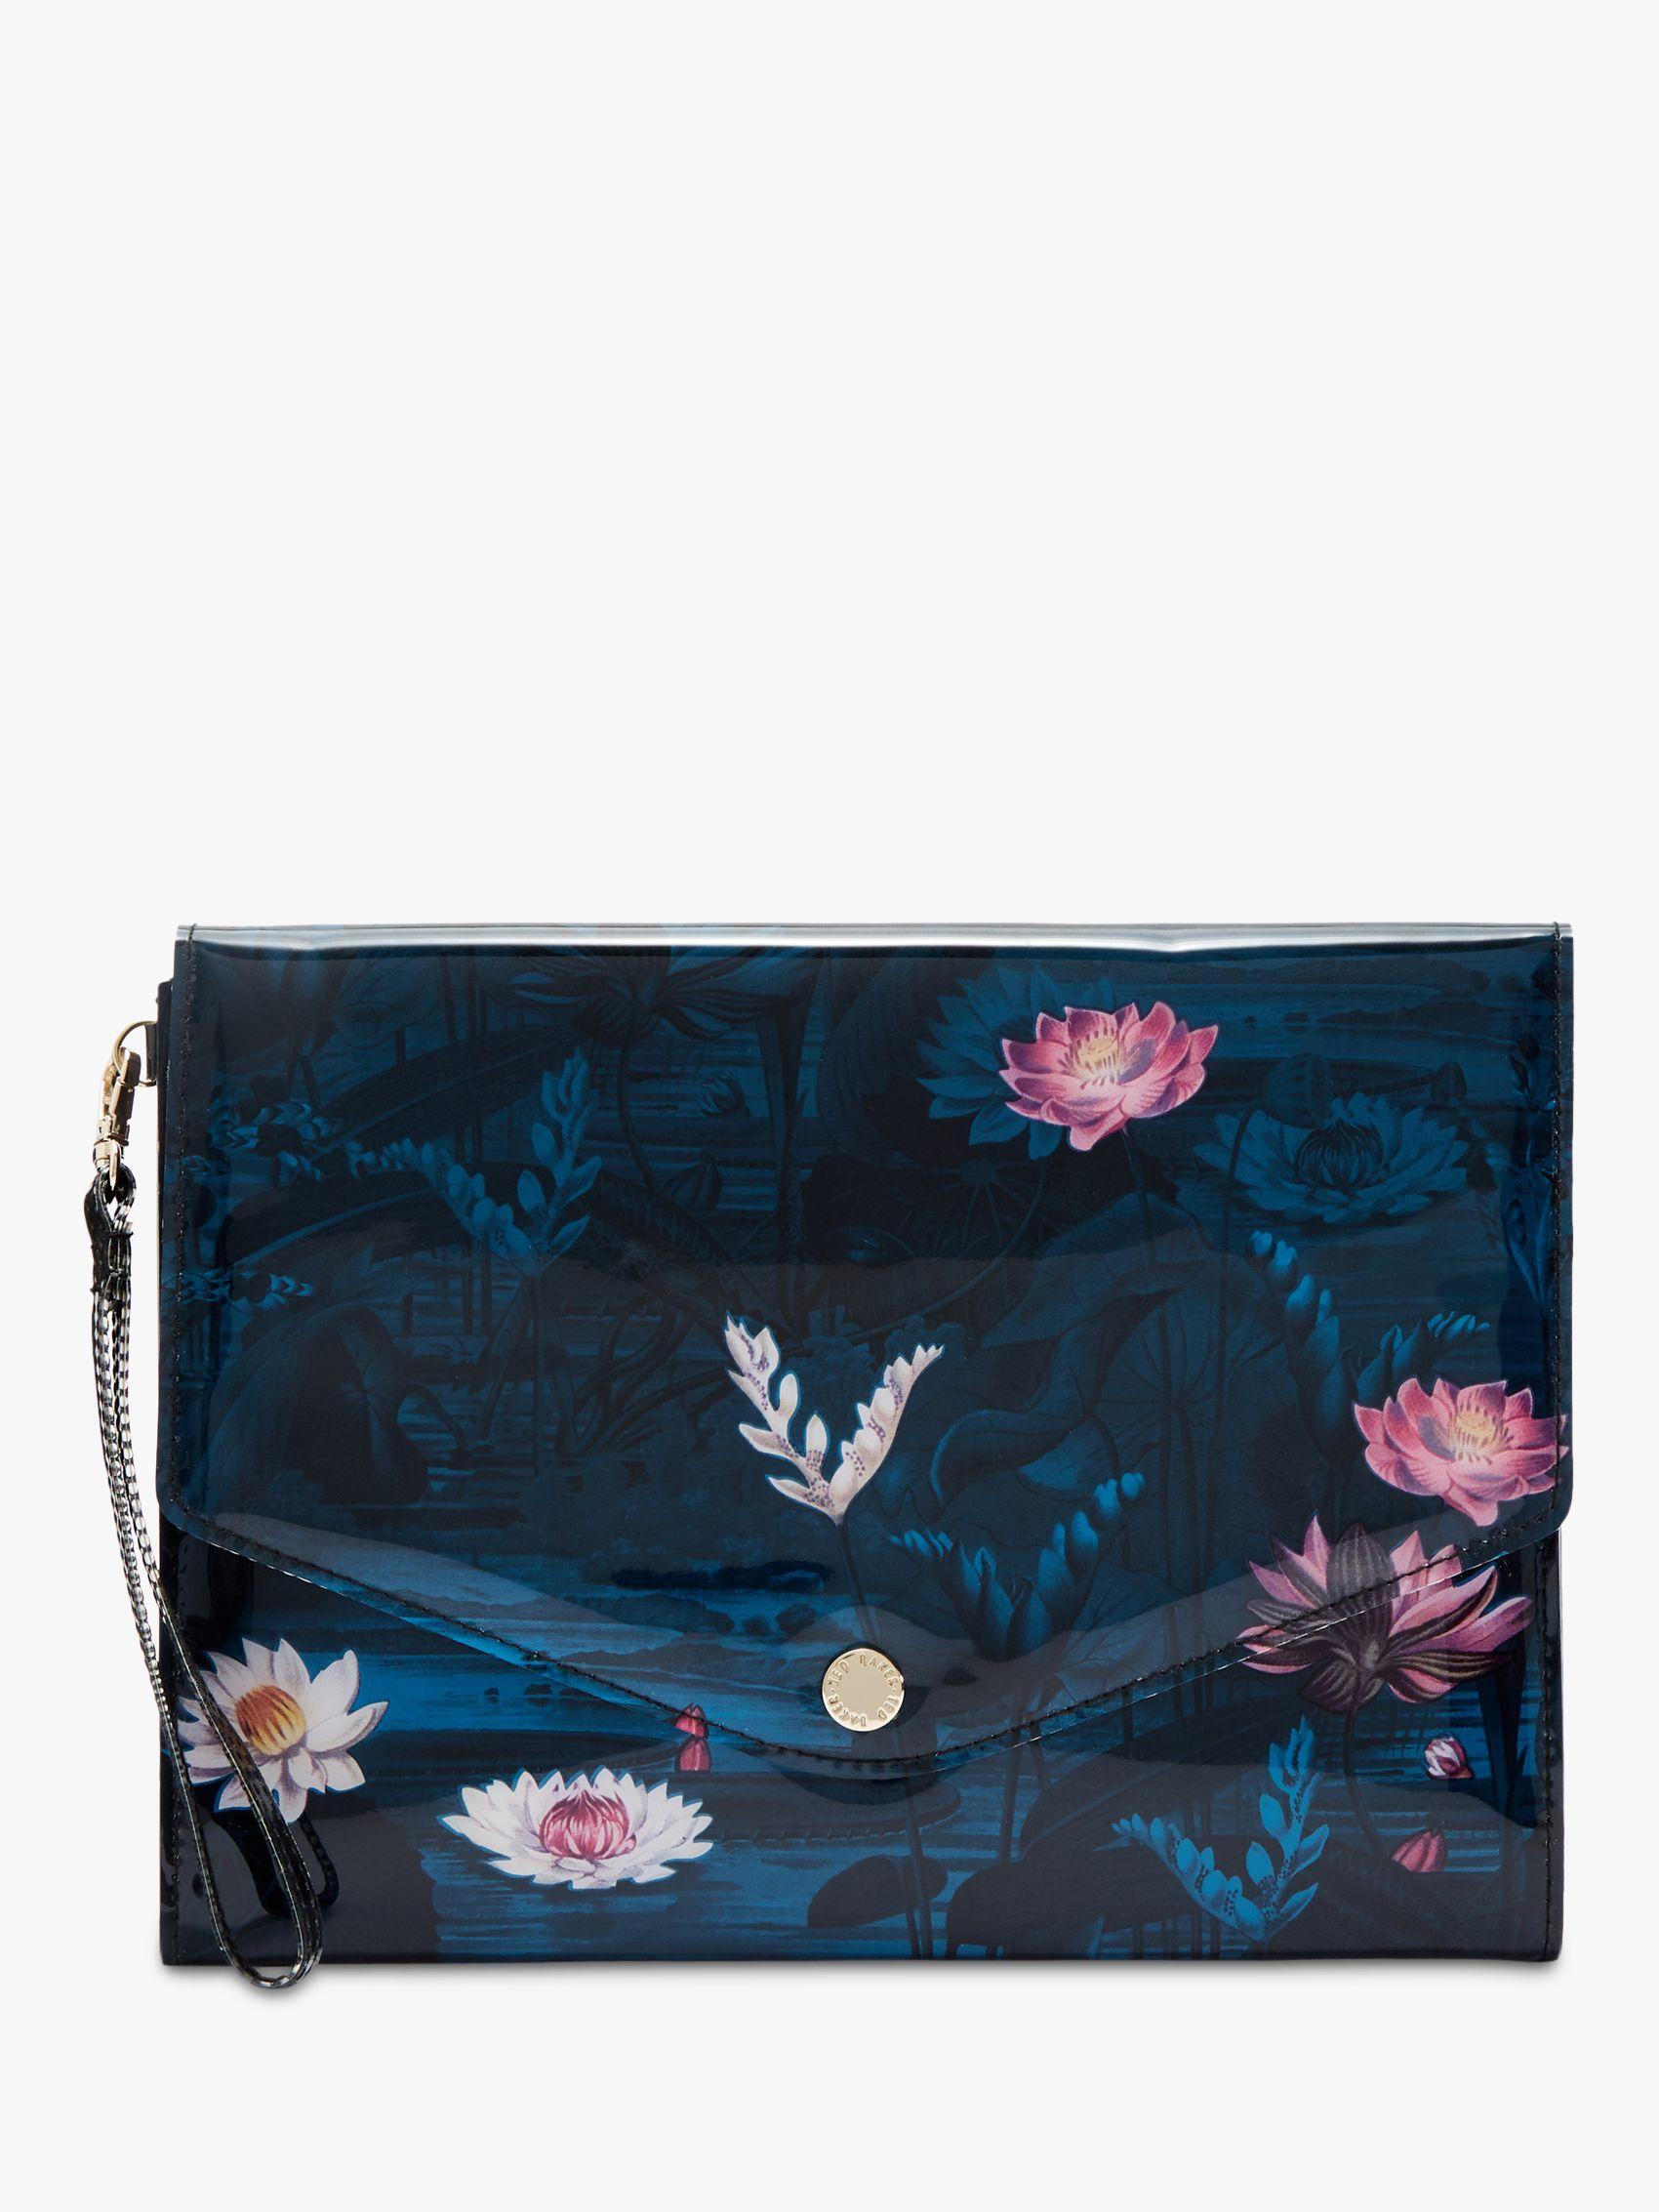 da16fc895276 Ted Baker Elzina Wonderland Pouch Clutch Bag in Blue - Lyst